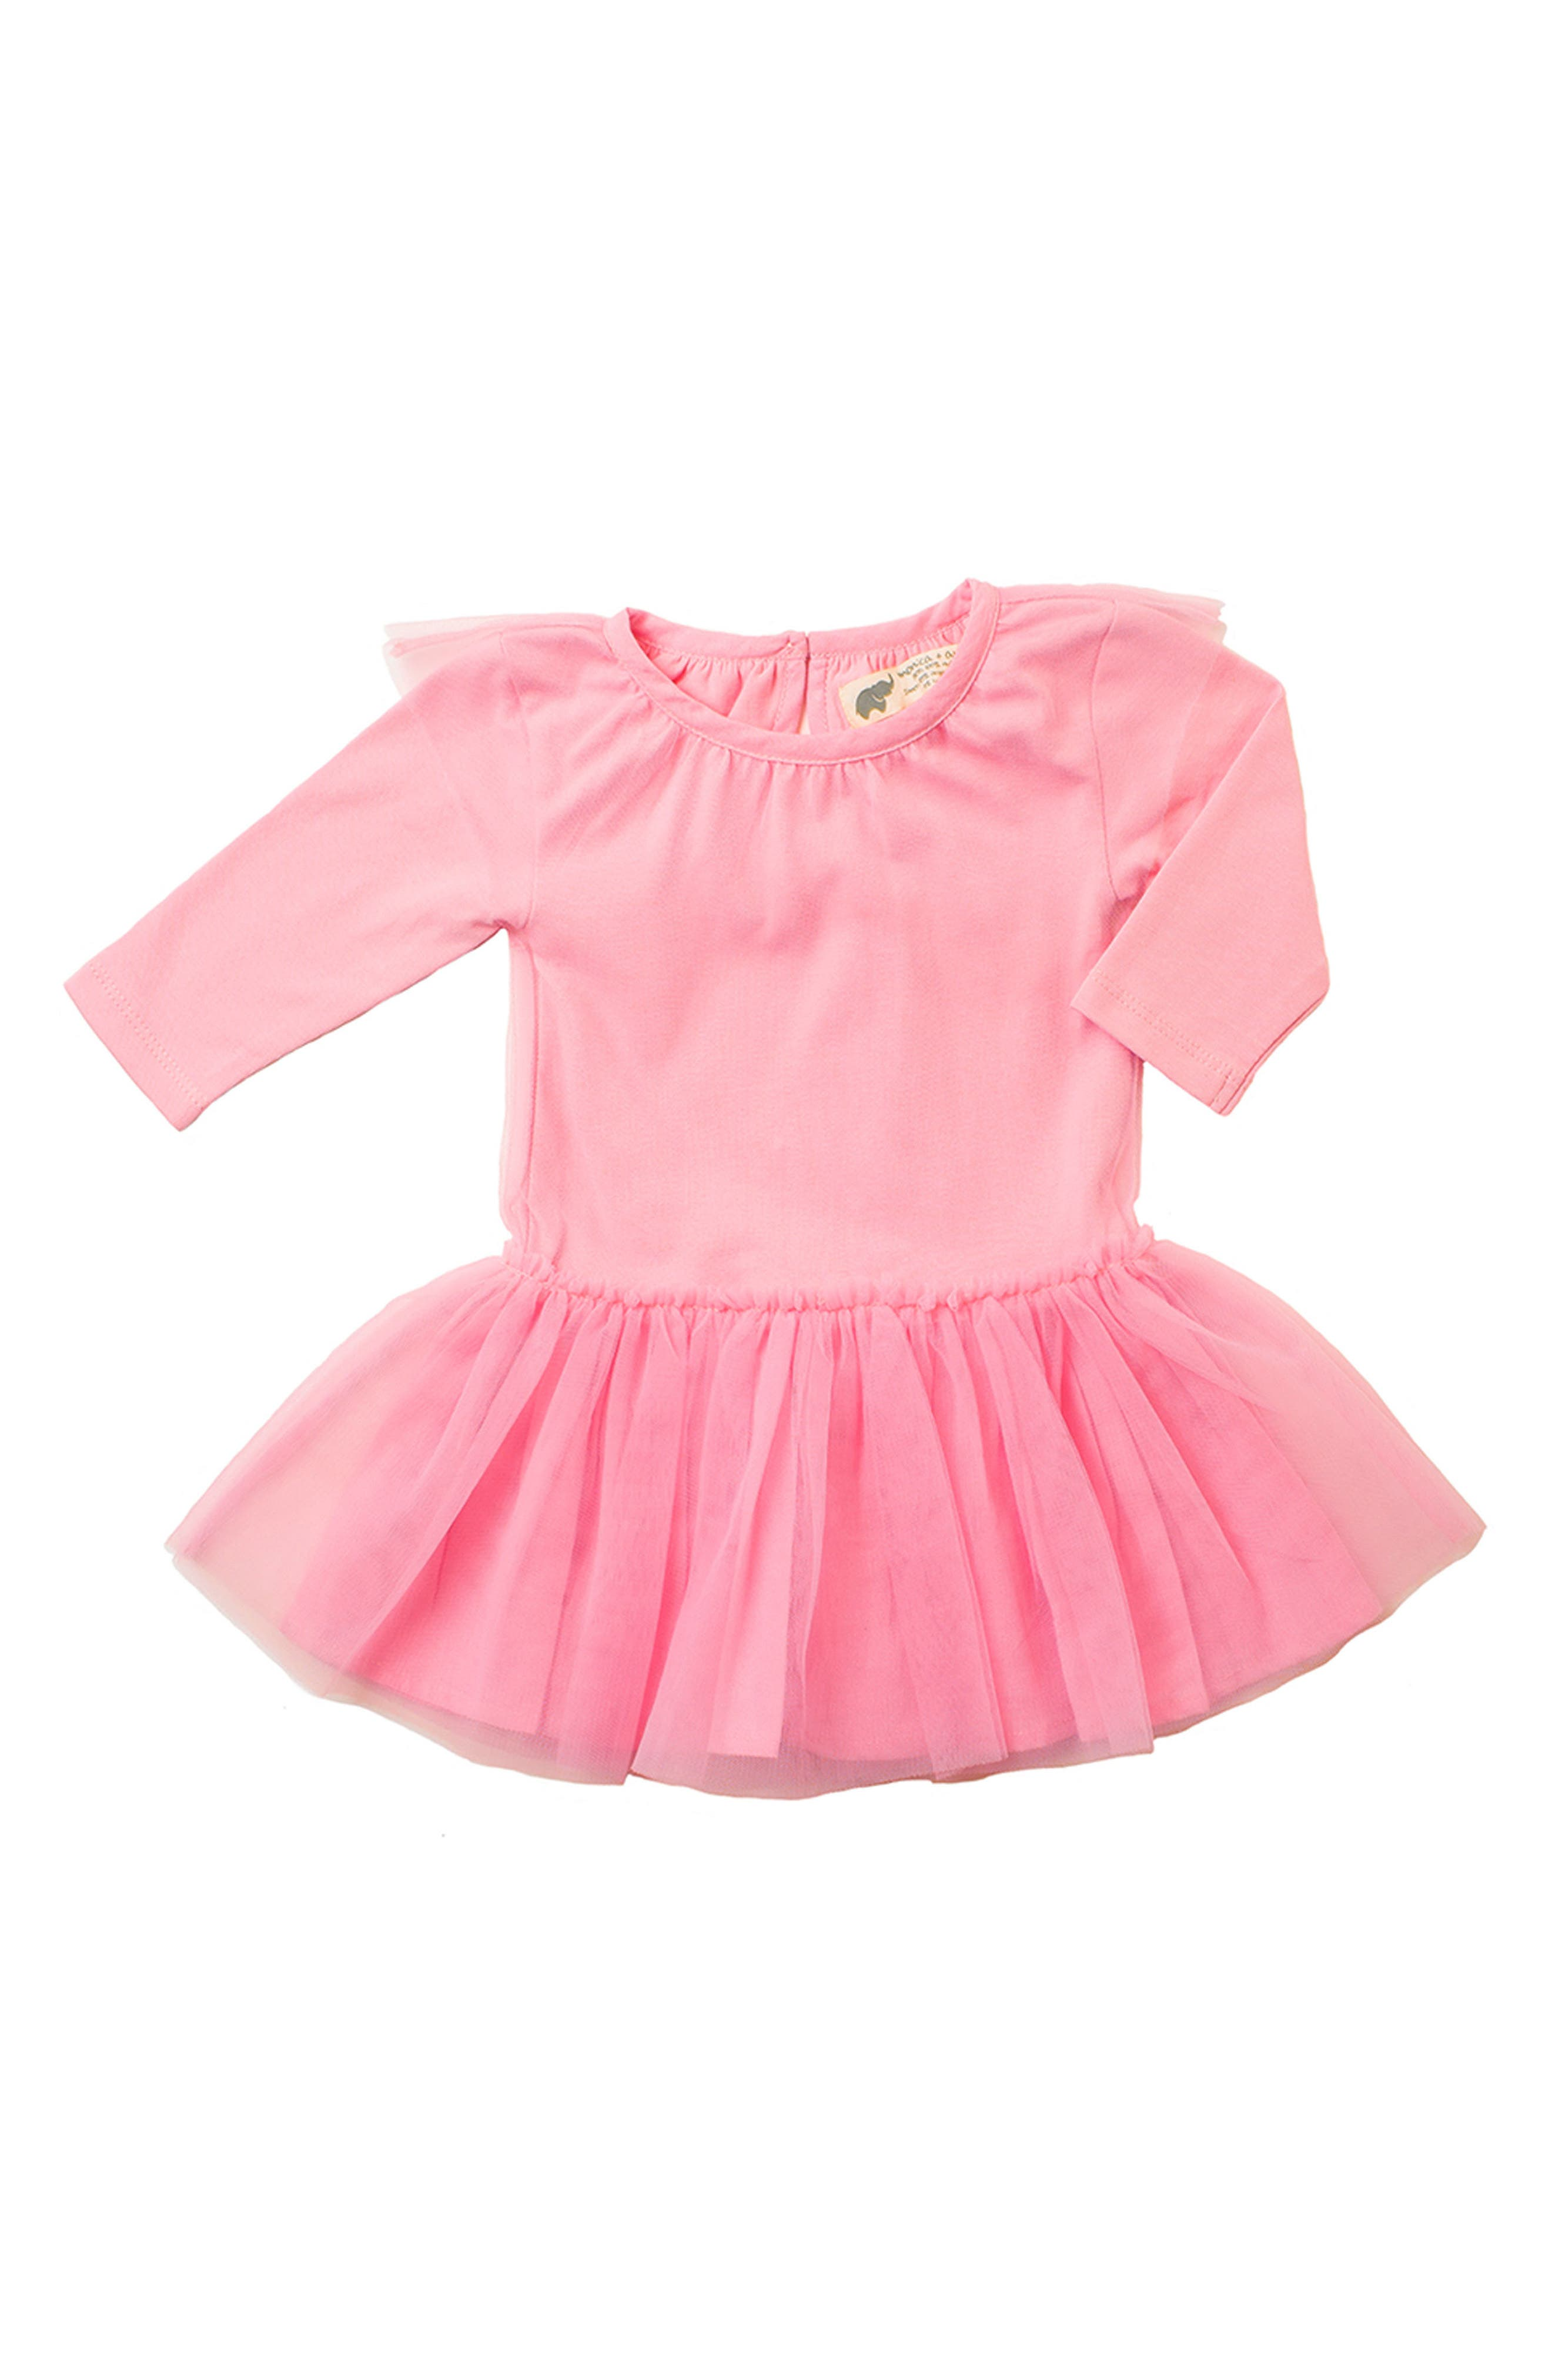 Little Belle Tulle Dress,                         Main,                         color, HOT PINK